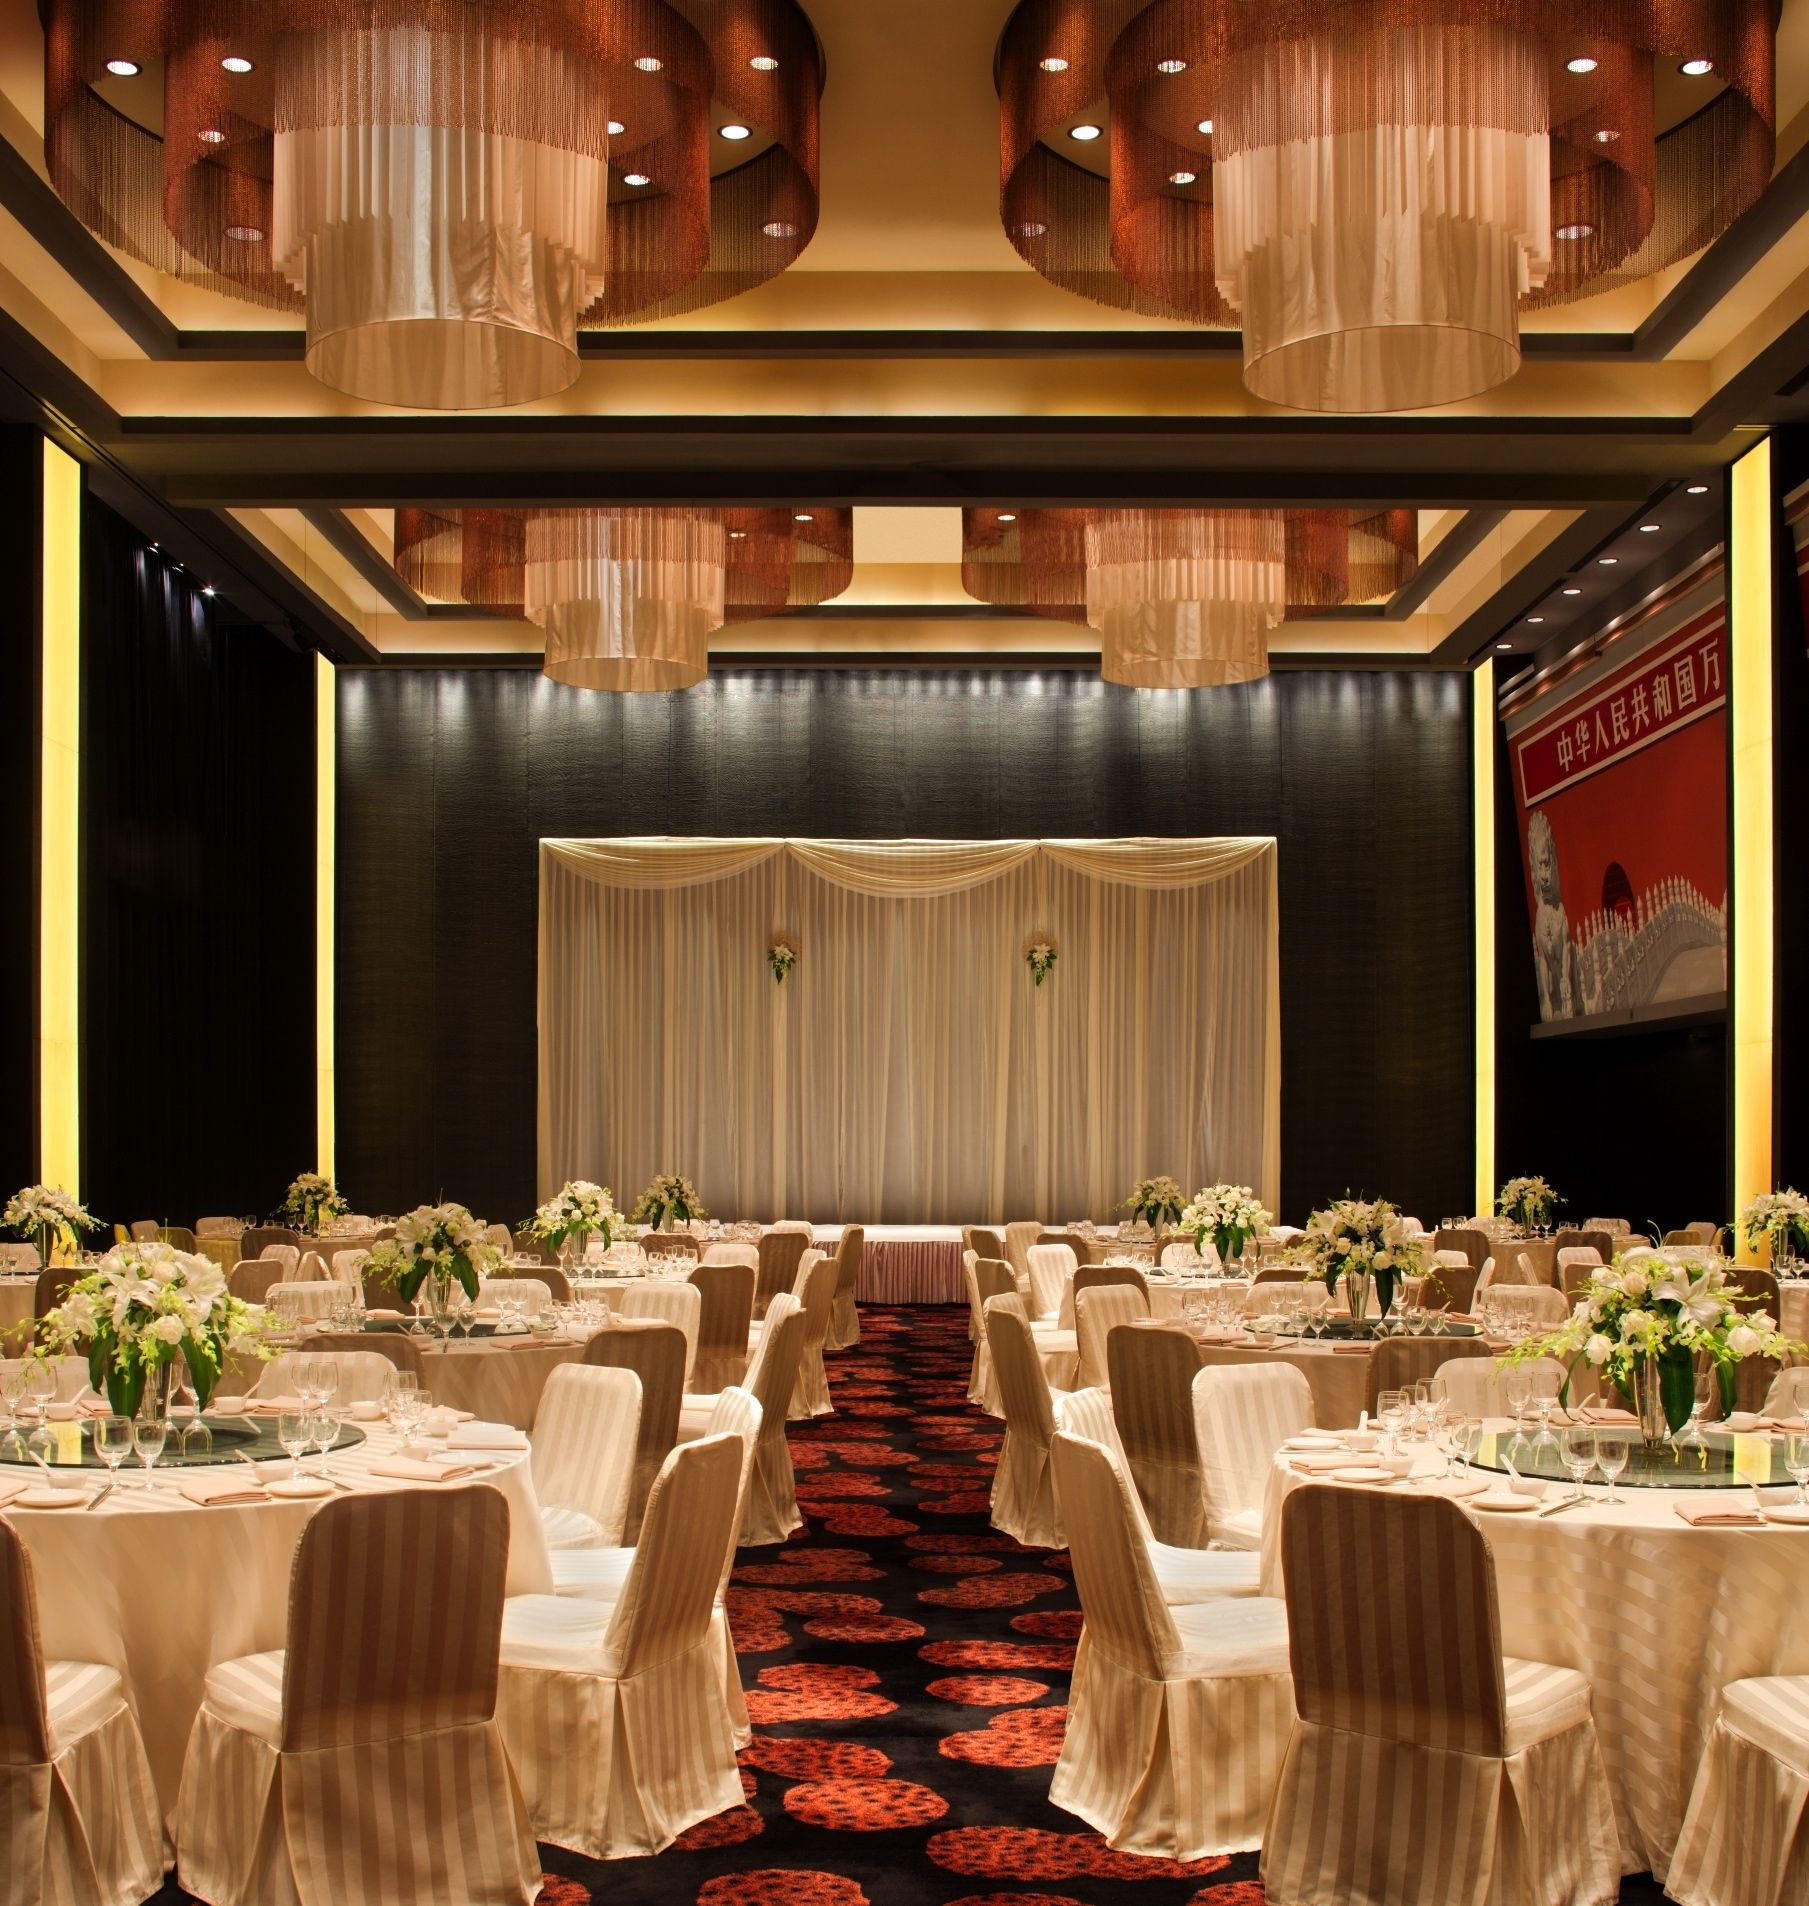 Banquette Hall: Banquet Hall